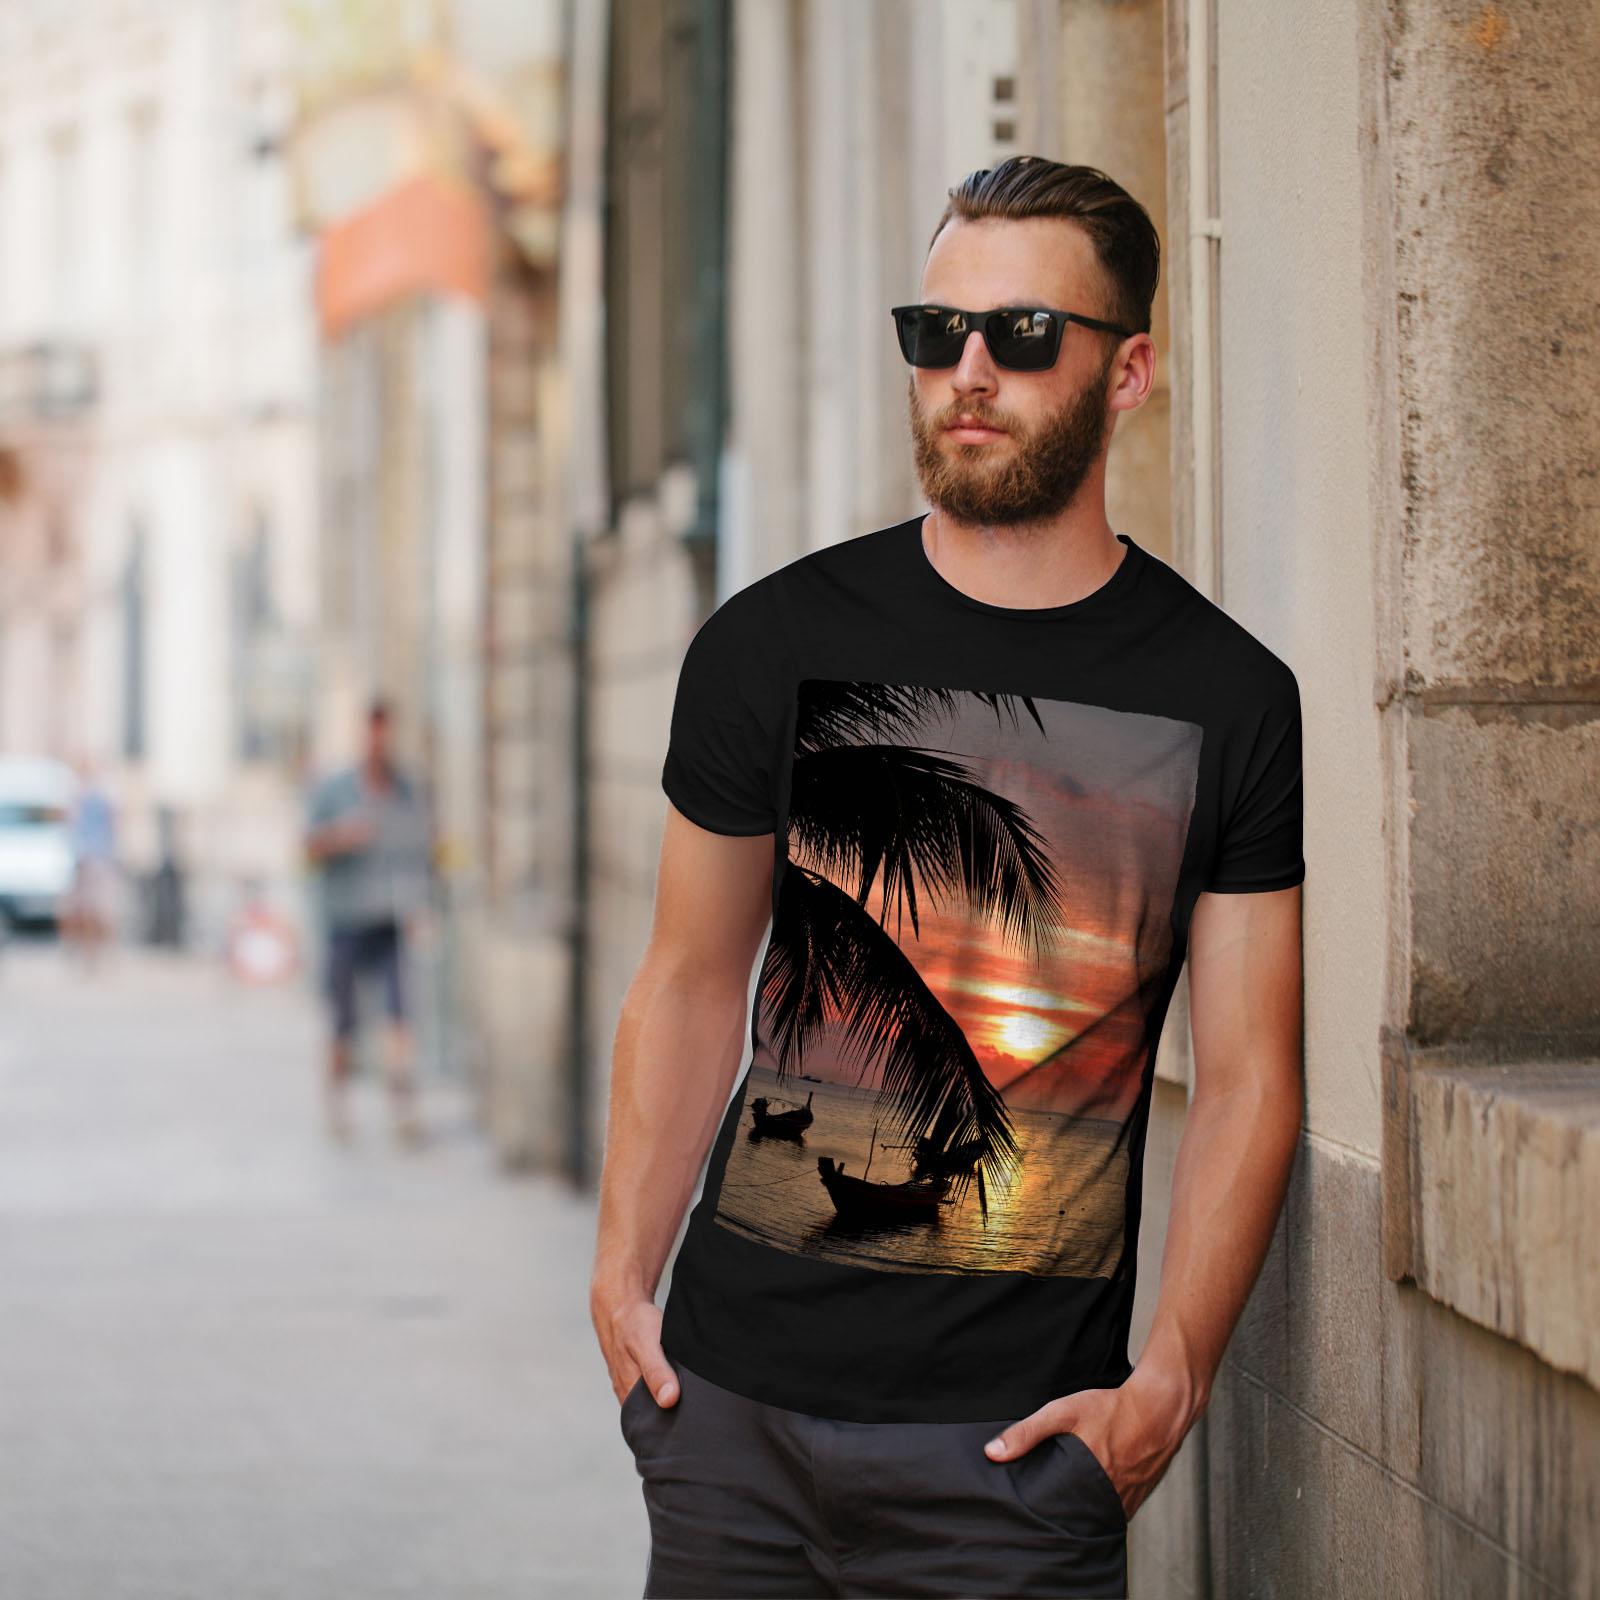 Wellcoda-Sunset-Palm-Tree-Mens-T-shirt-Ocean-Beach-Graphic-Design-Printed-Tee thumbnail 5